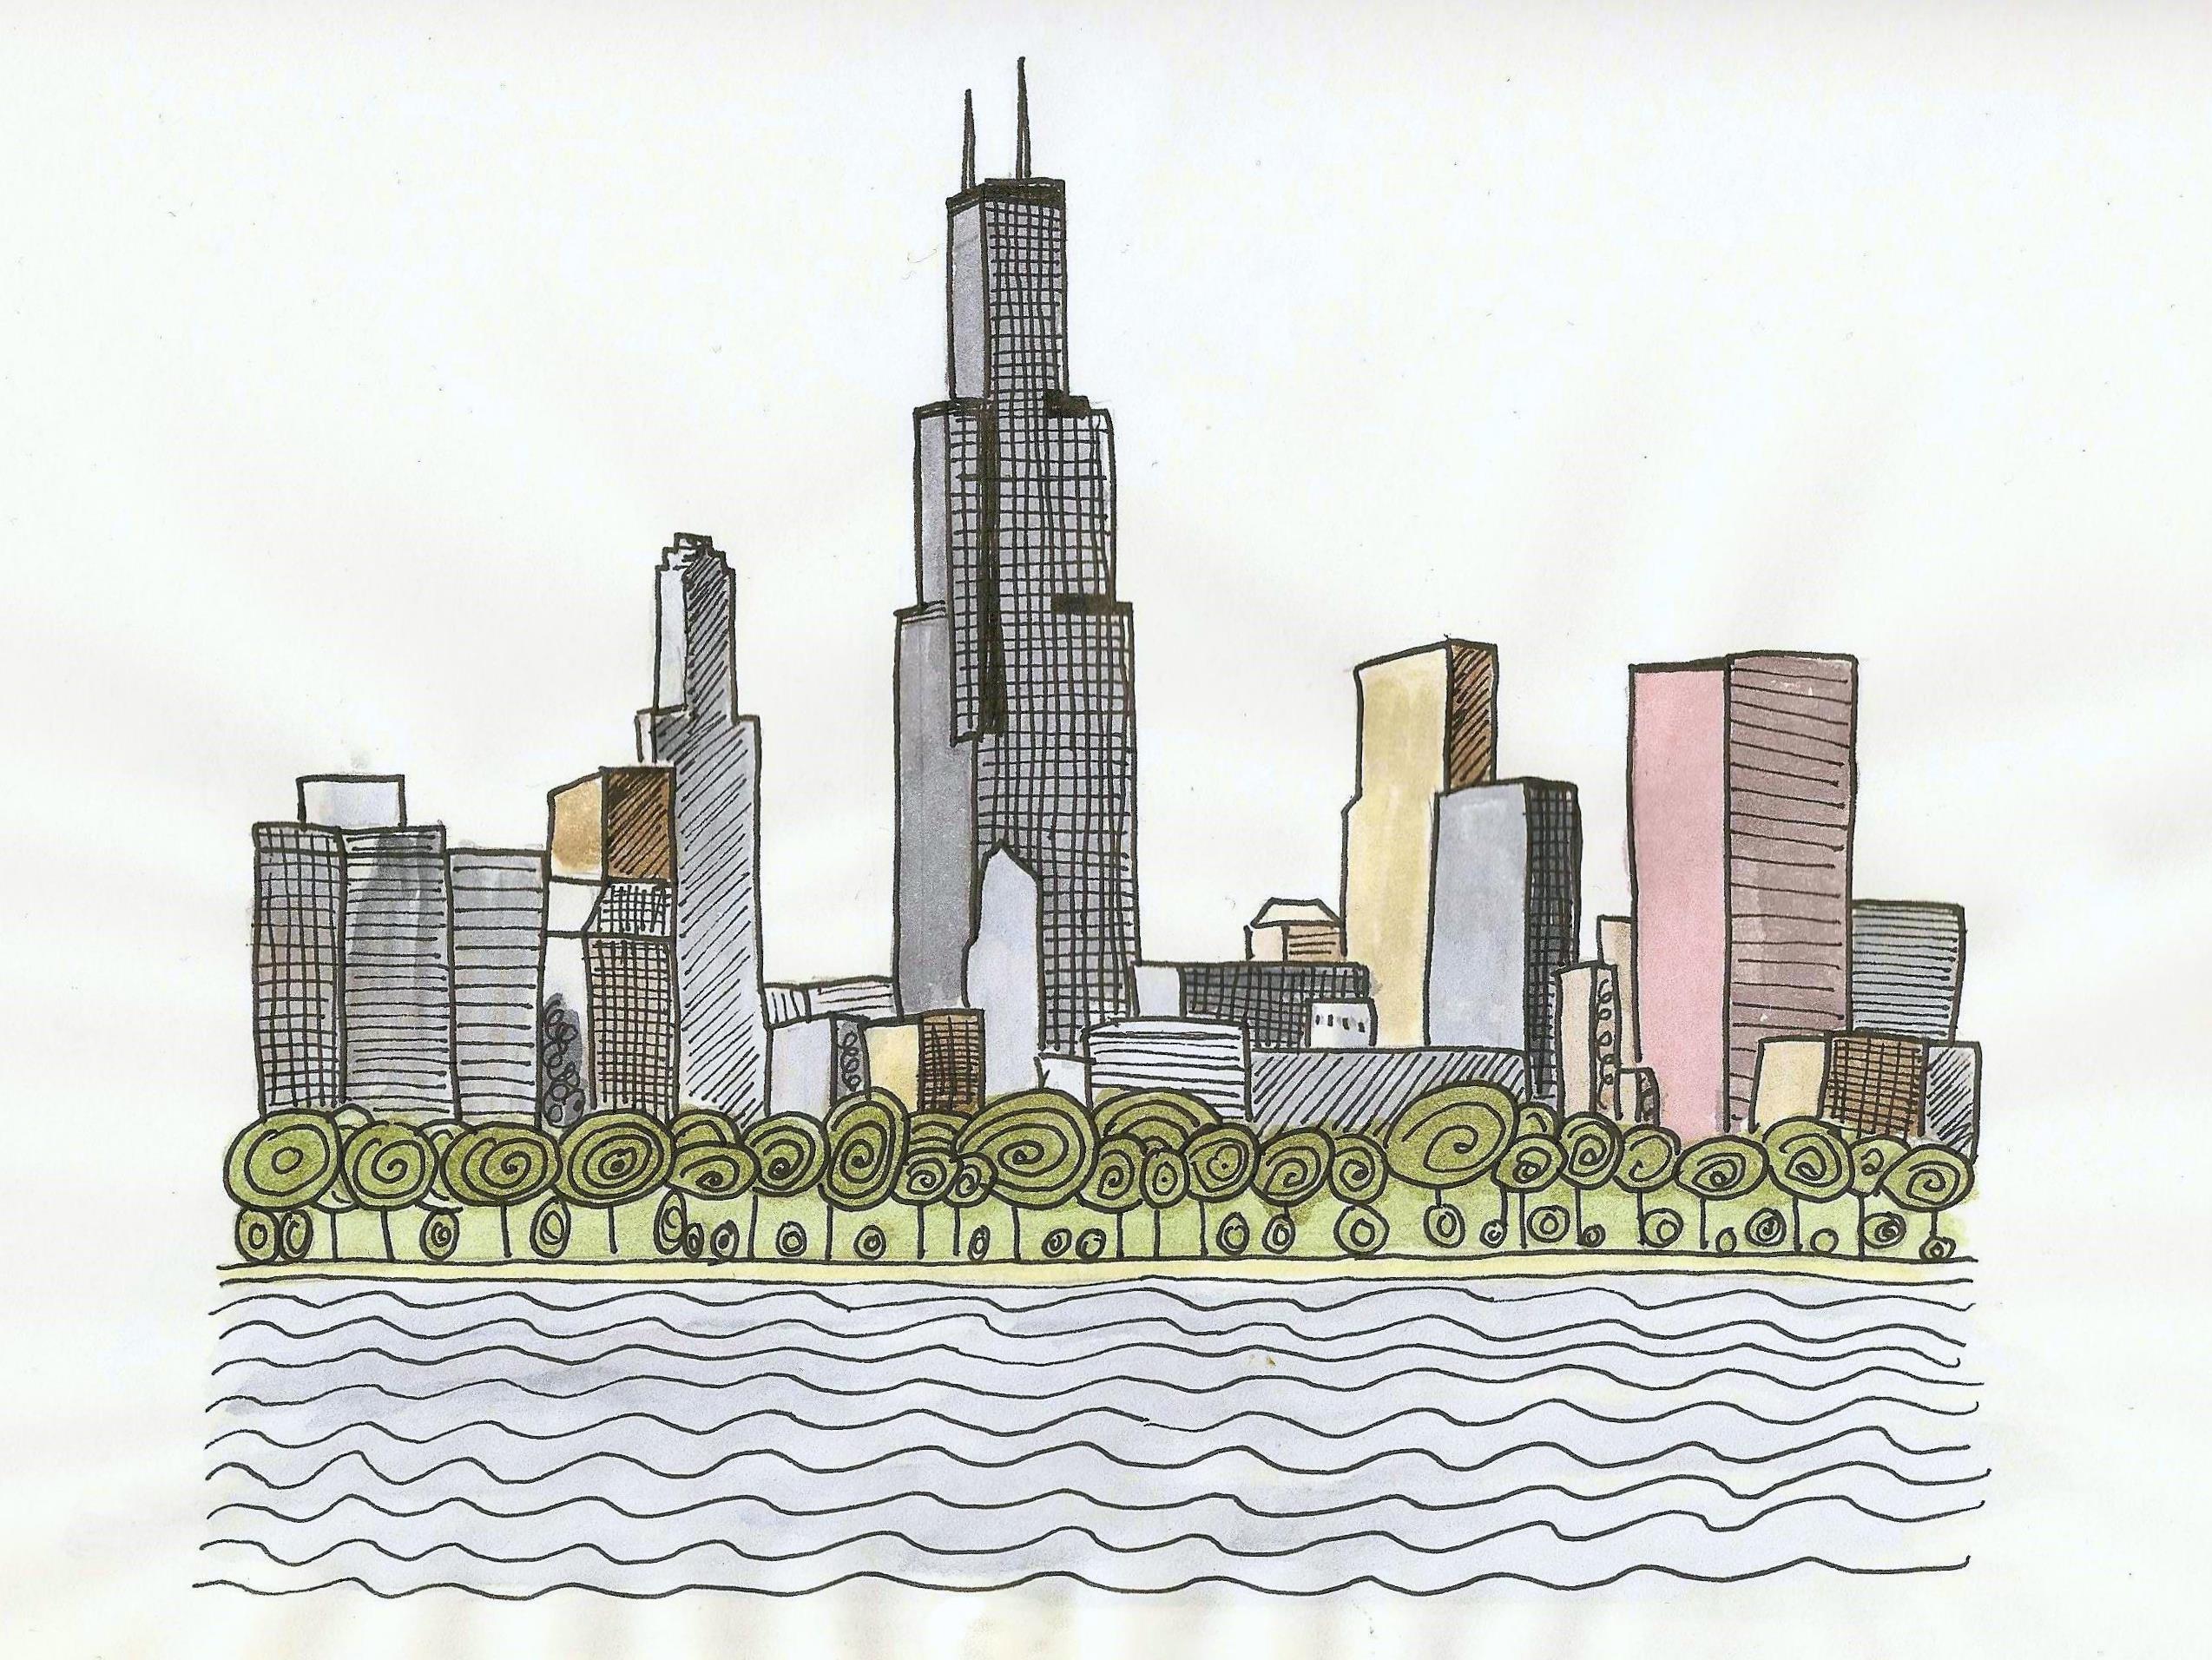 2548x1912 Chicago Skyline Making Made